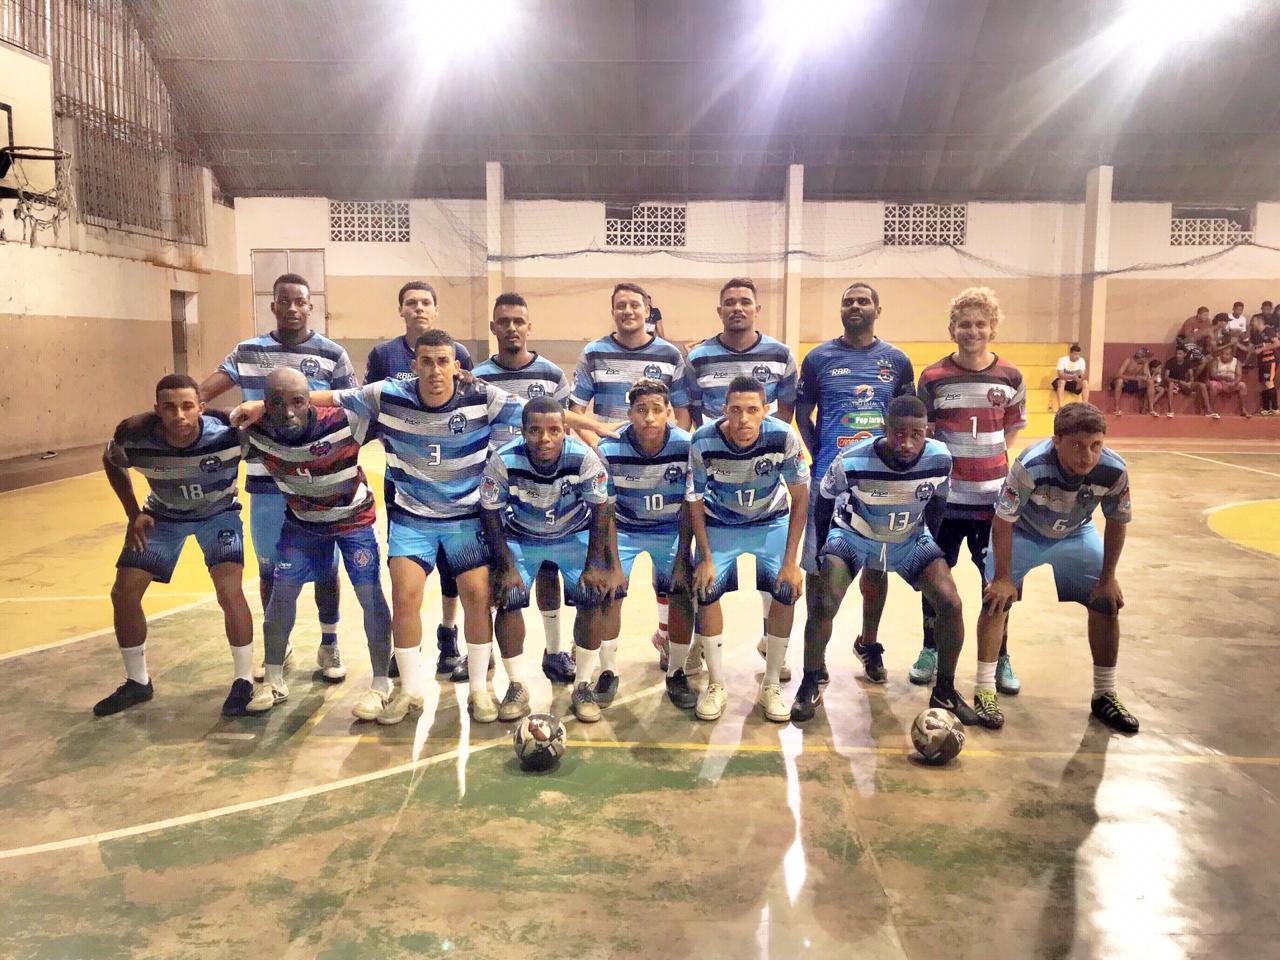 Laje Futsal vence Itaperuna em amistoso em Laje do Muriaé  ab605d8b178aa